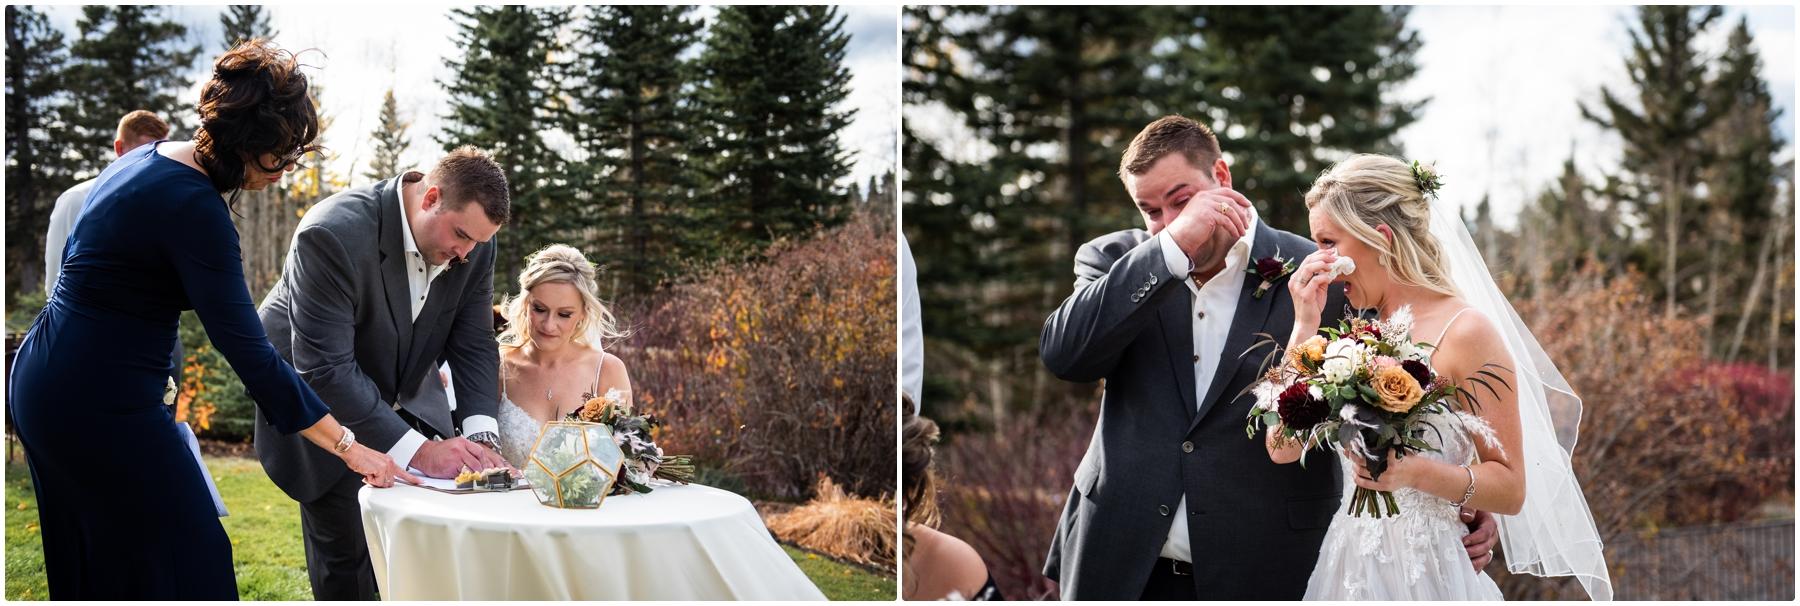 Autumn Azuridge Estate Hotel Wedding Outdoor Ceremony Photographer